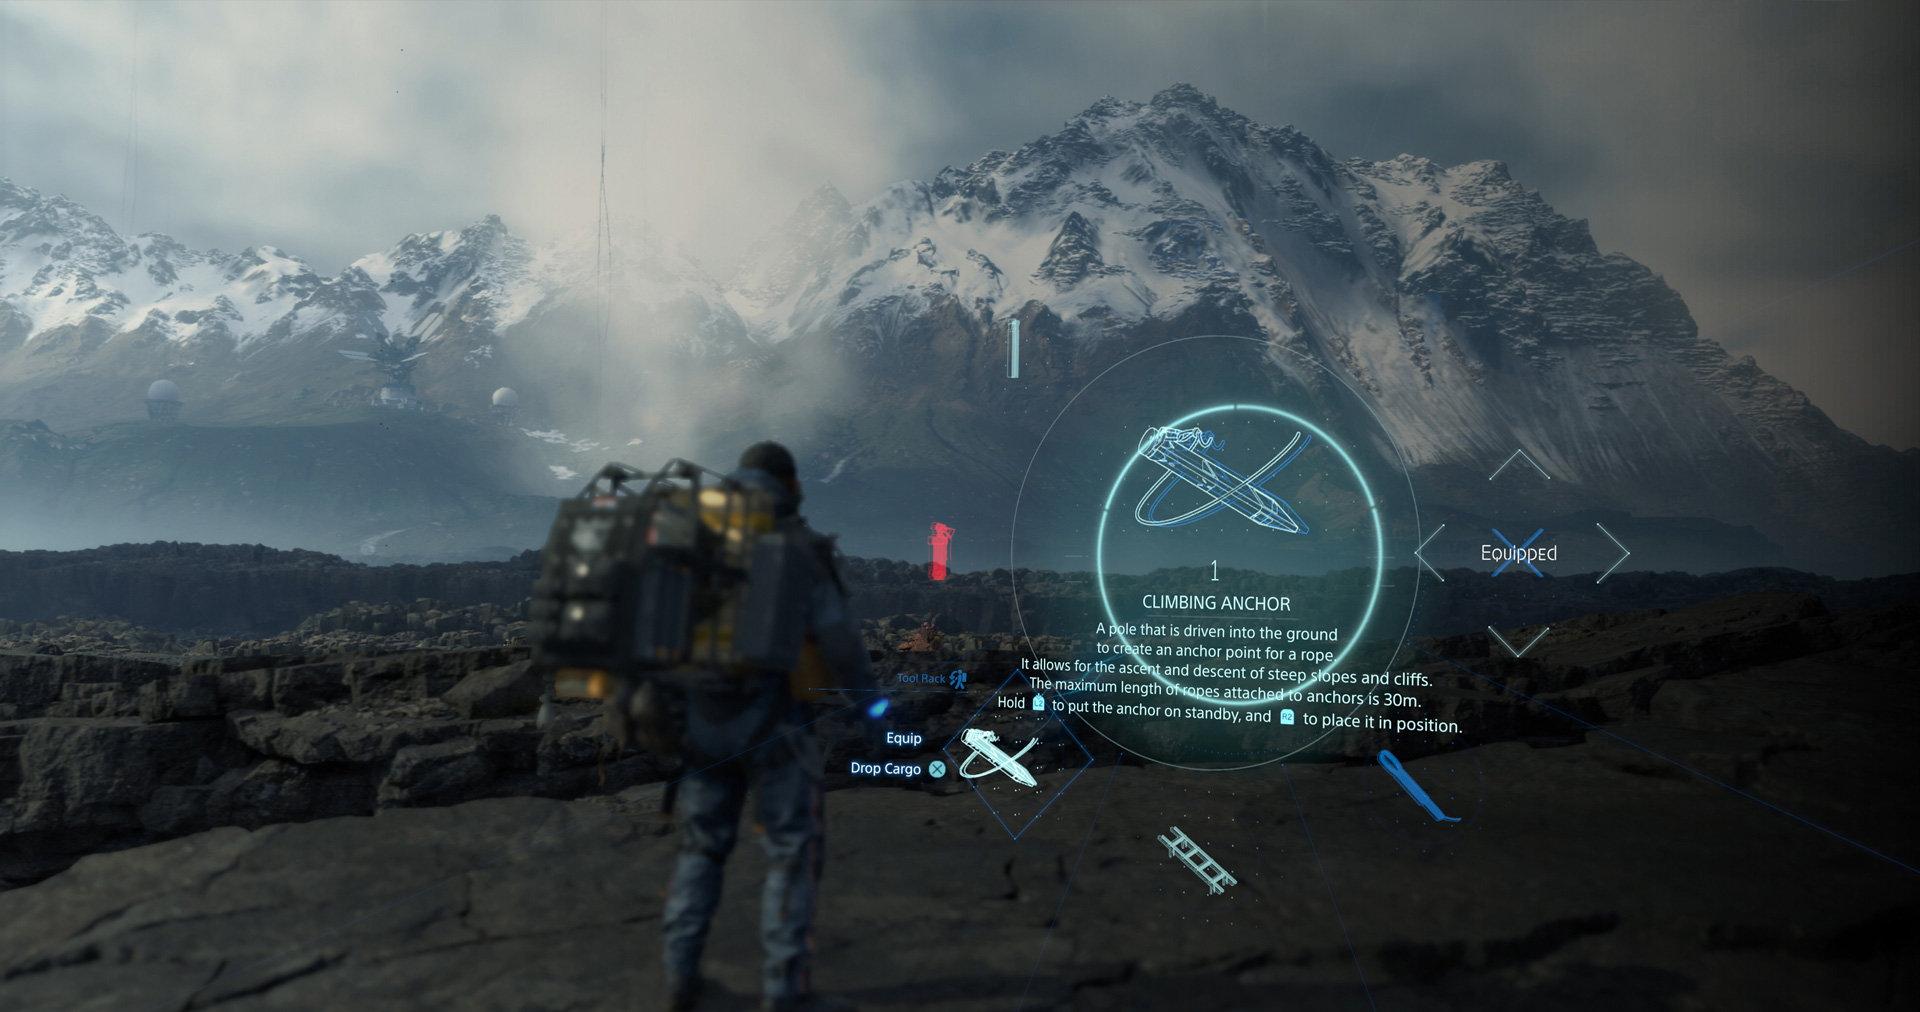 death-stranding-pre-order-screens-04-ps4